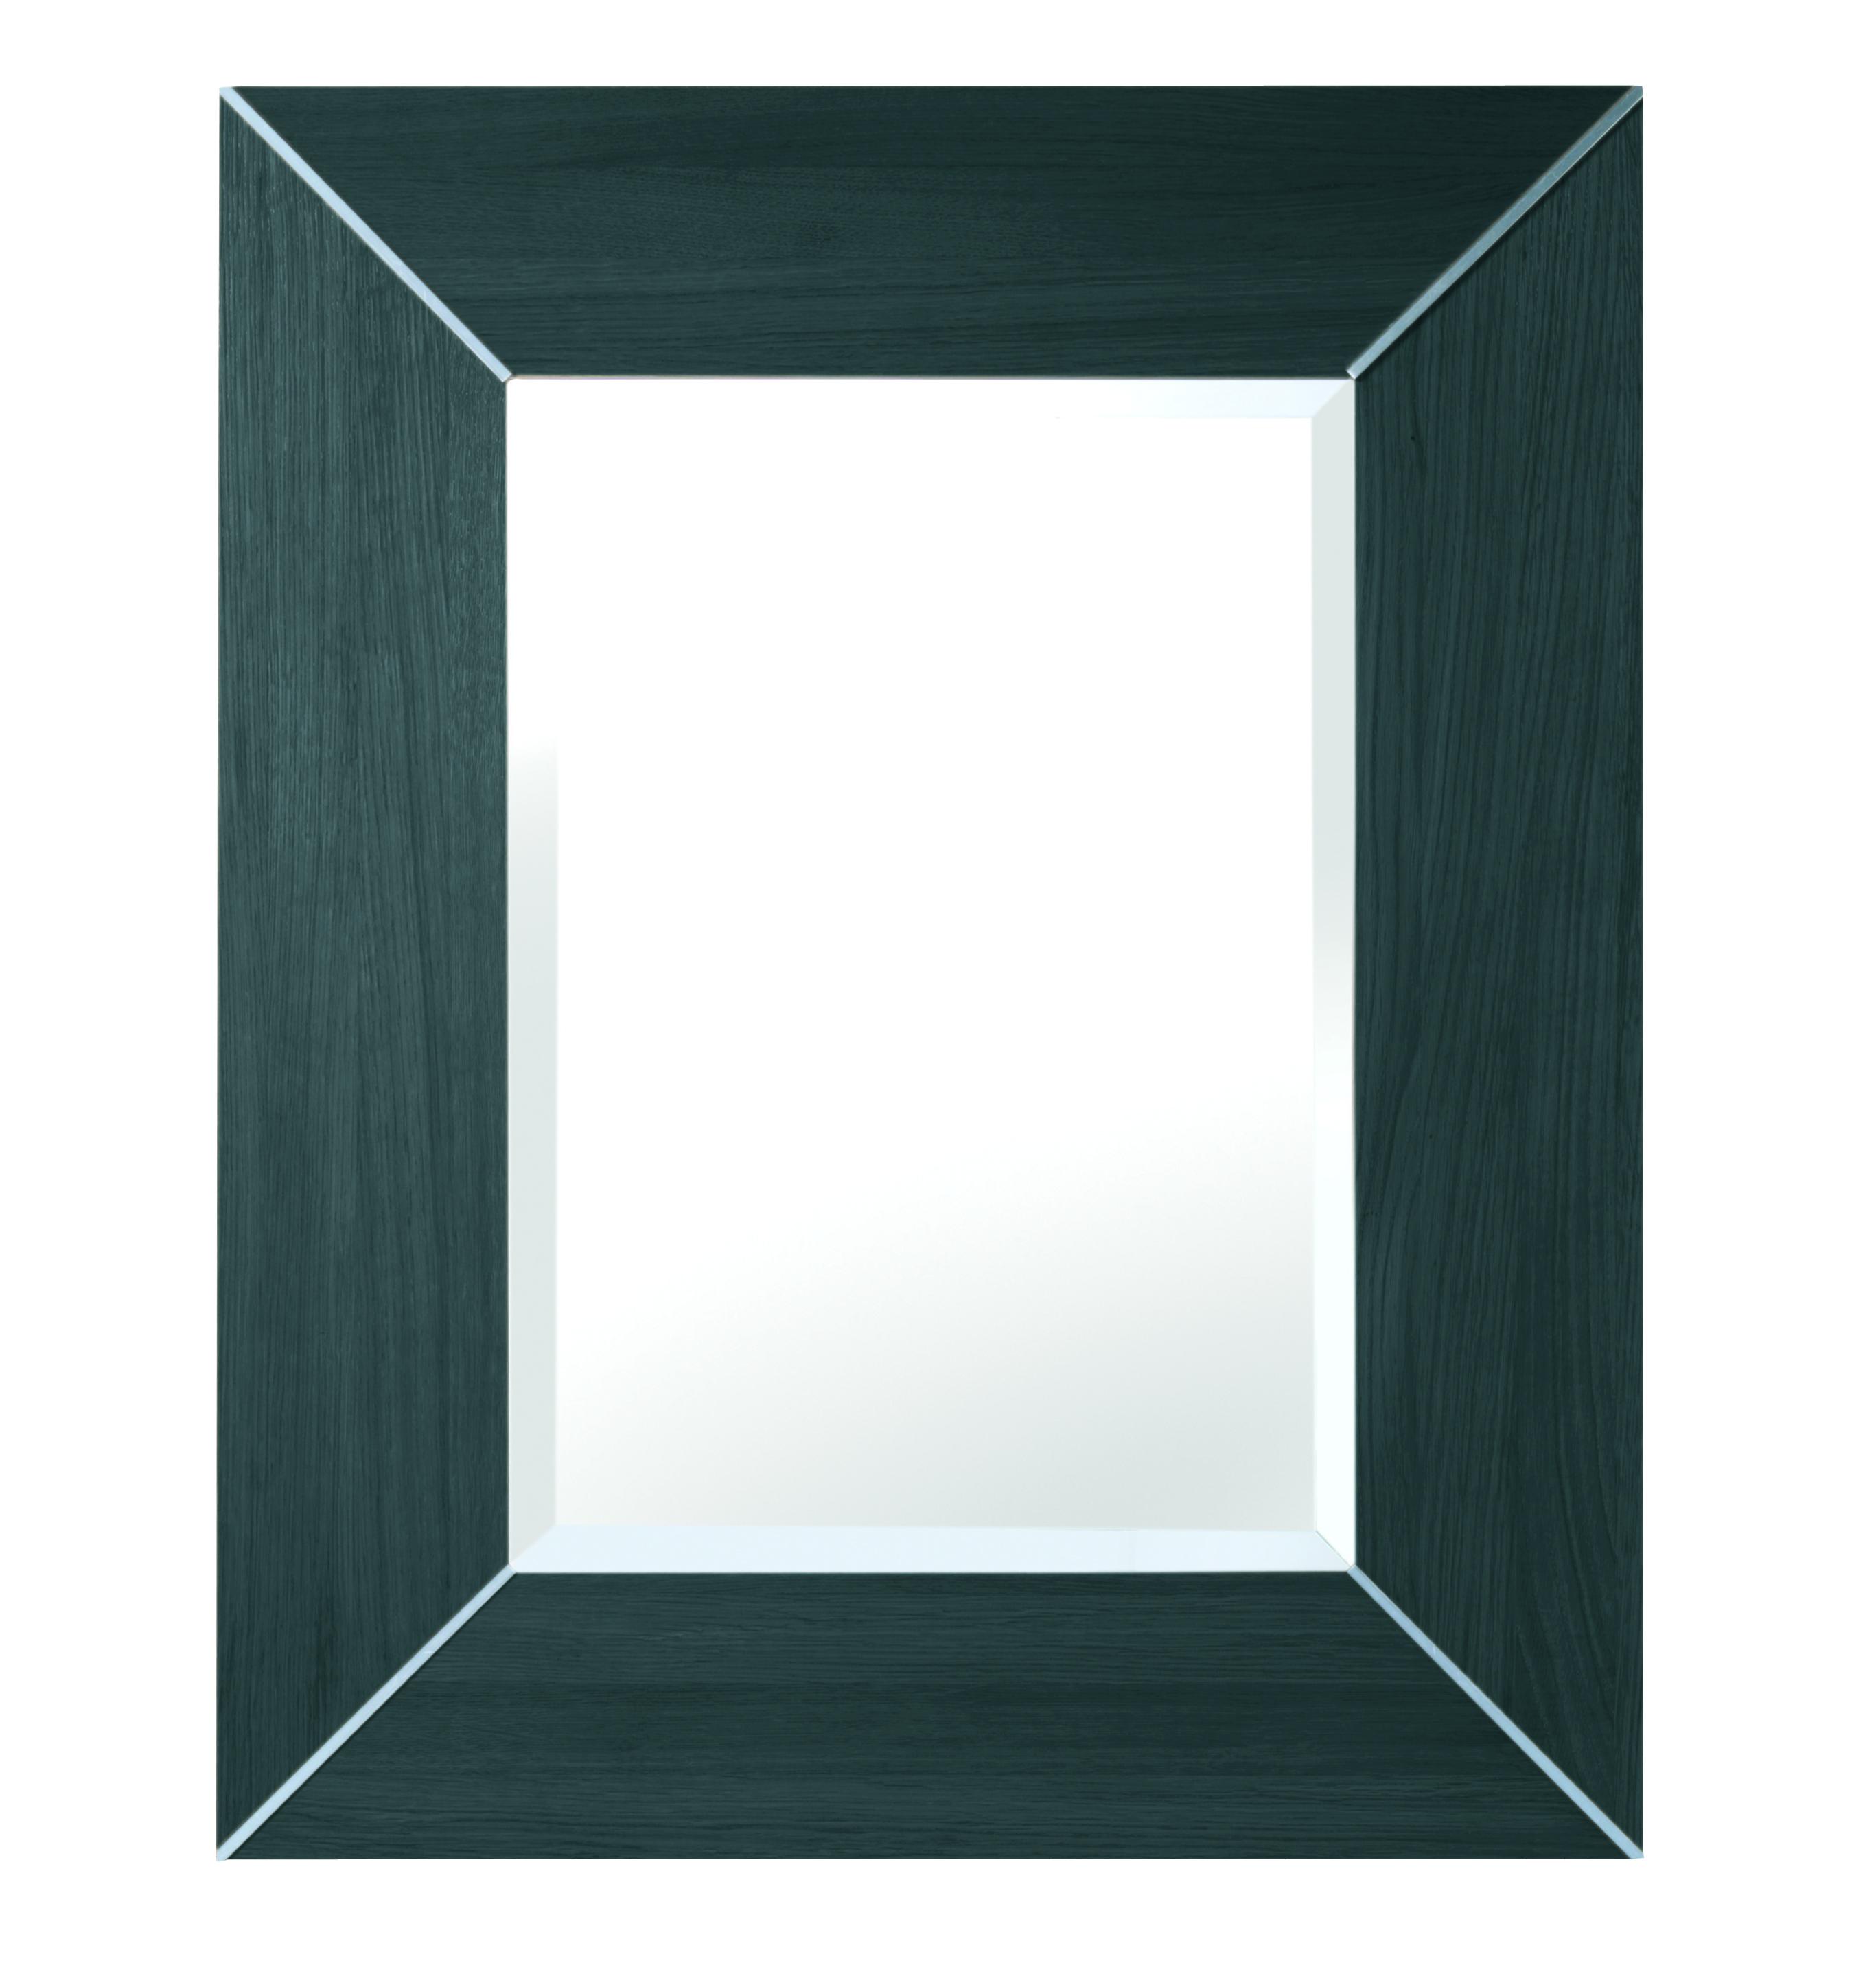 miroir de luxe lillian imperial imperial xlu0049020. Black Bedroom Furniture Sets. Home Design Ideas